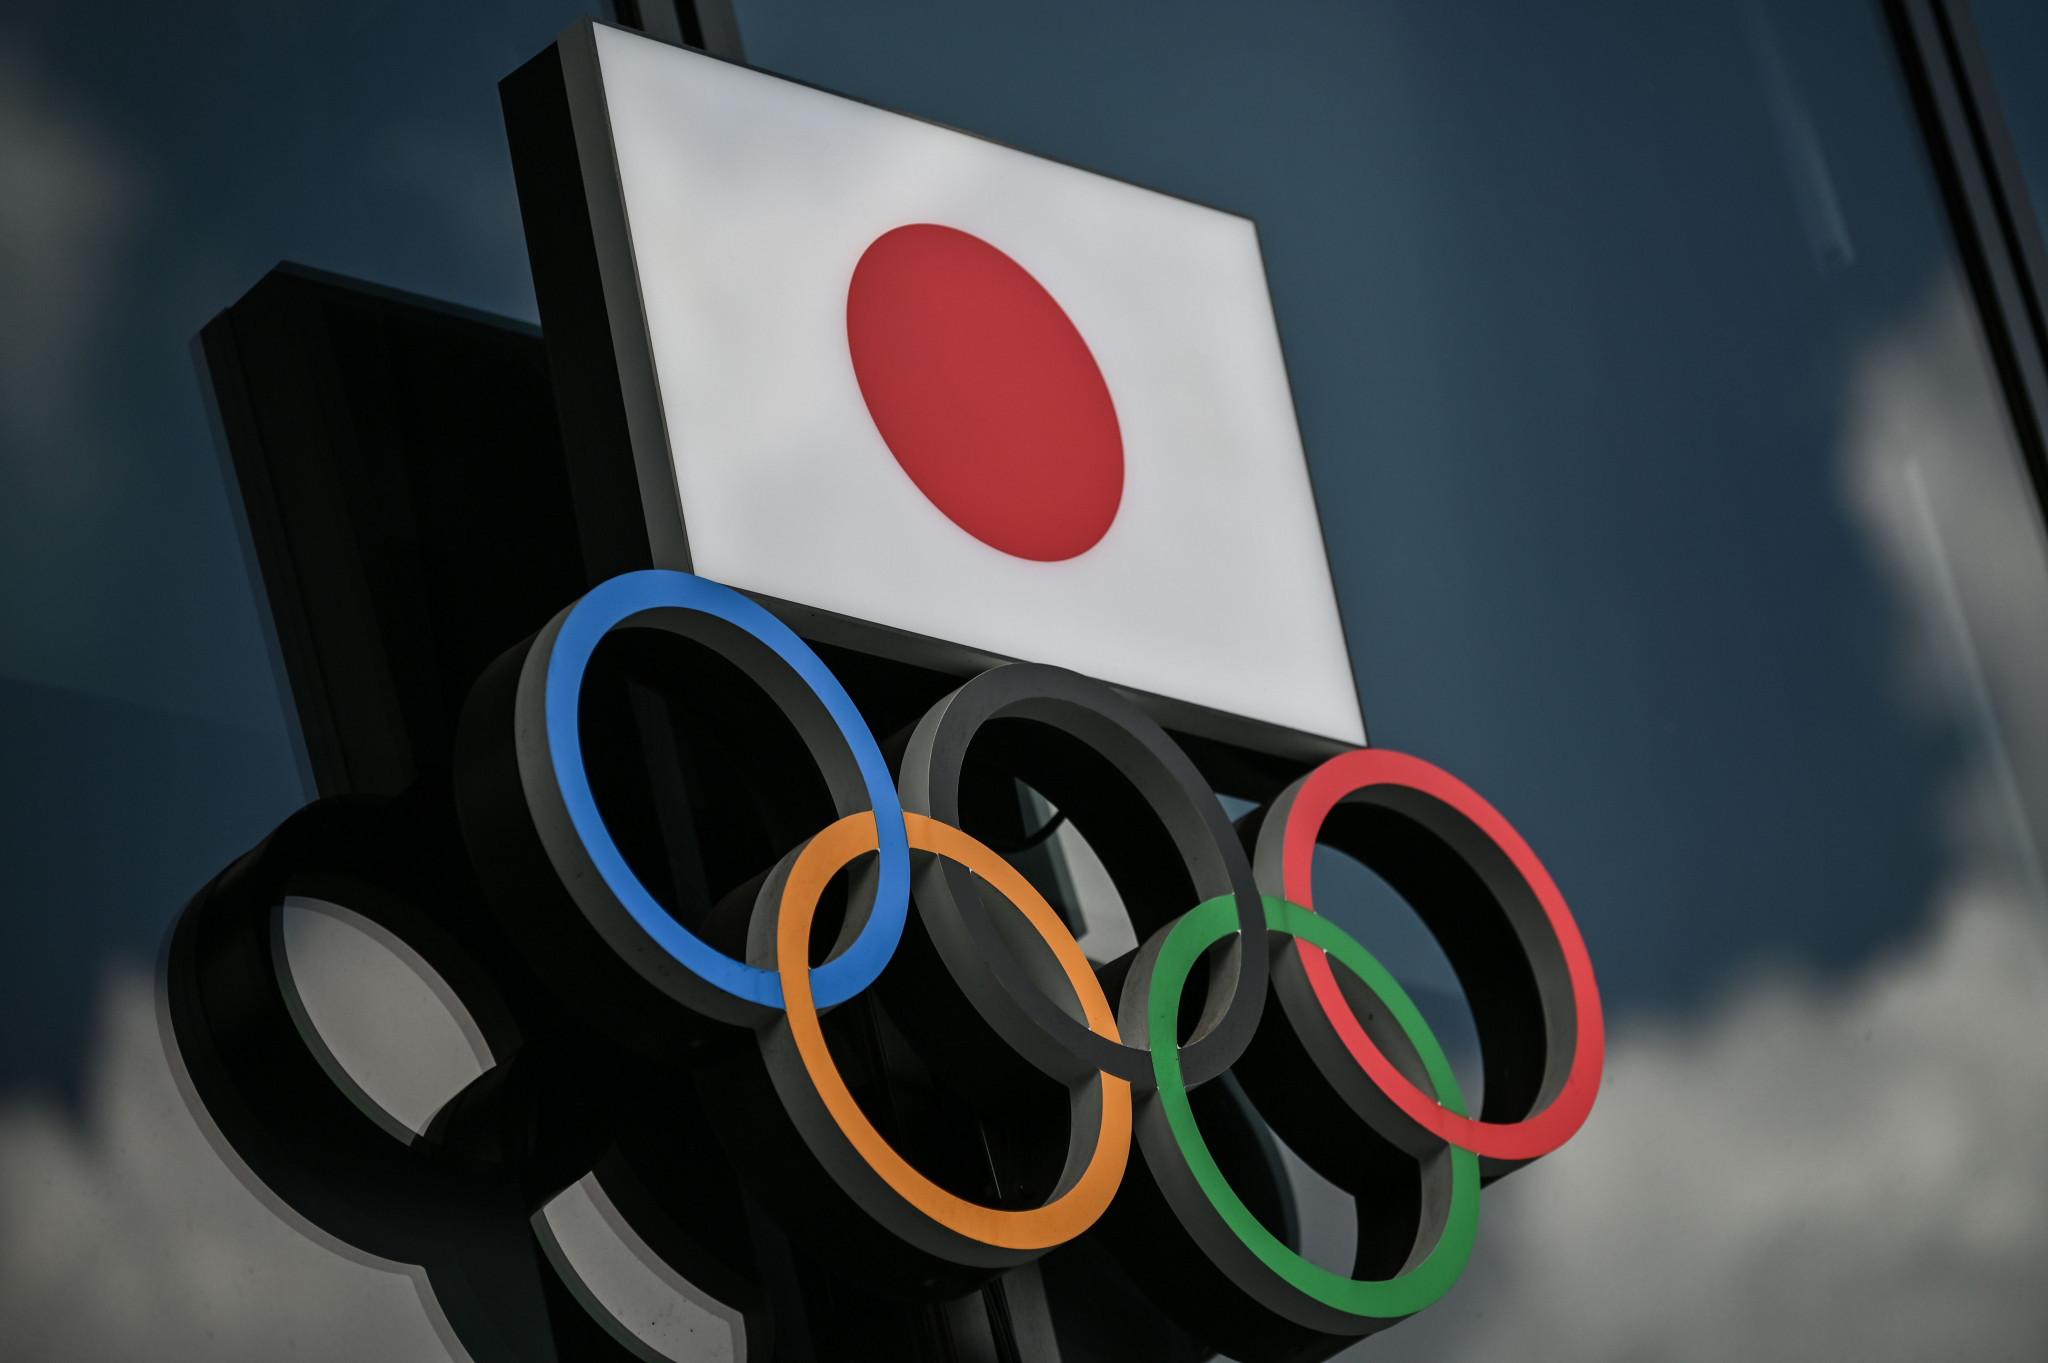 Tokio 2020 integra expertos informáticos para contrarrestar posibles ciberataques